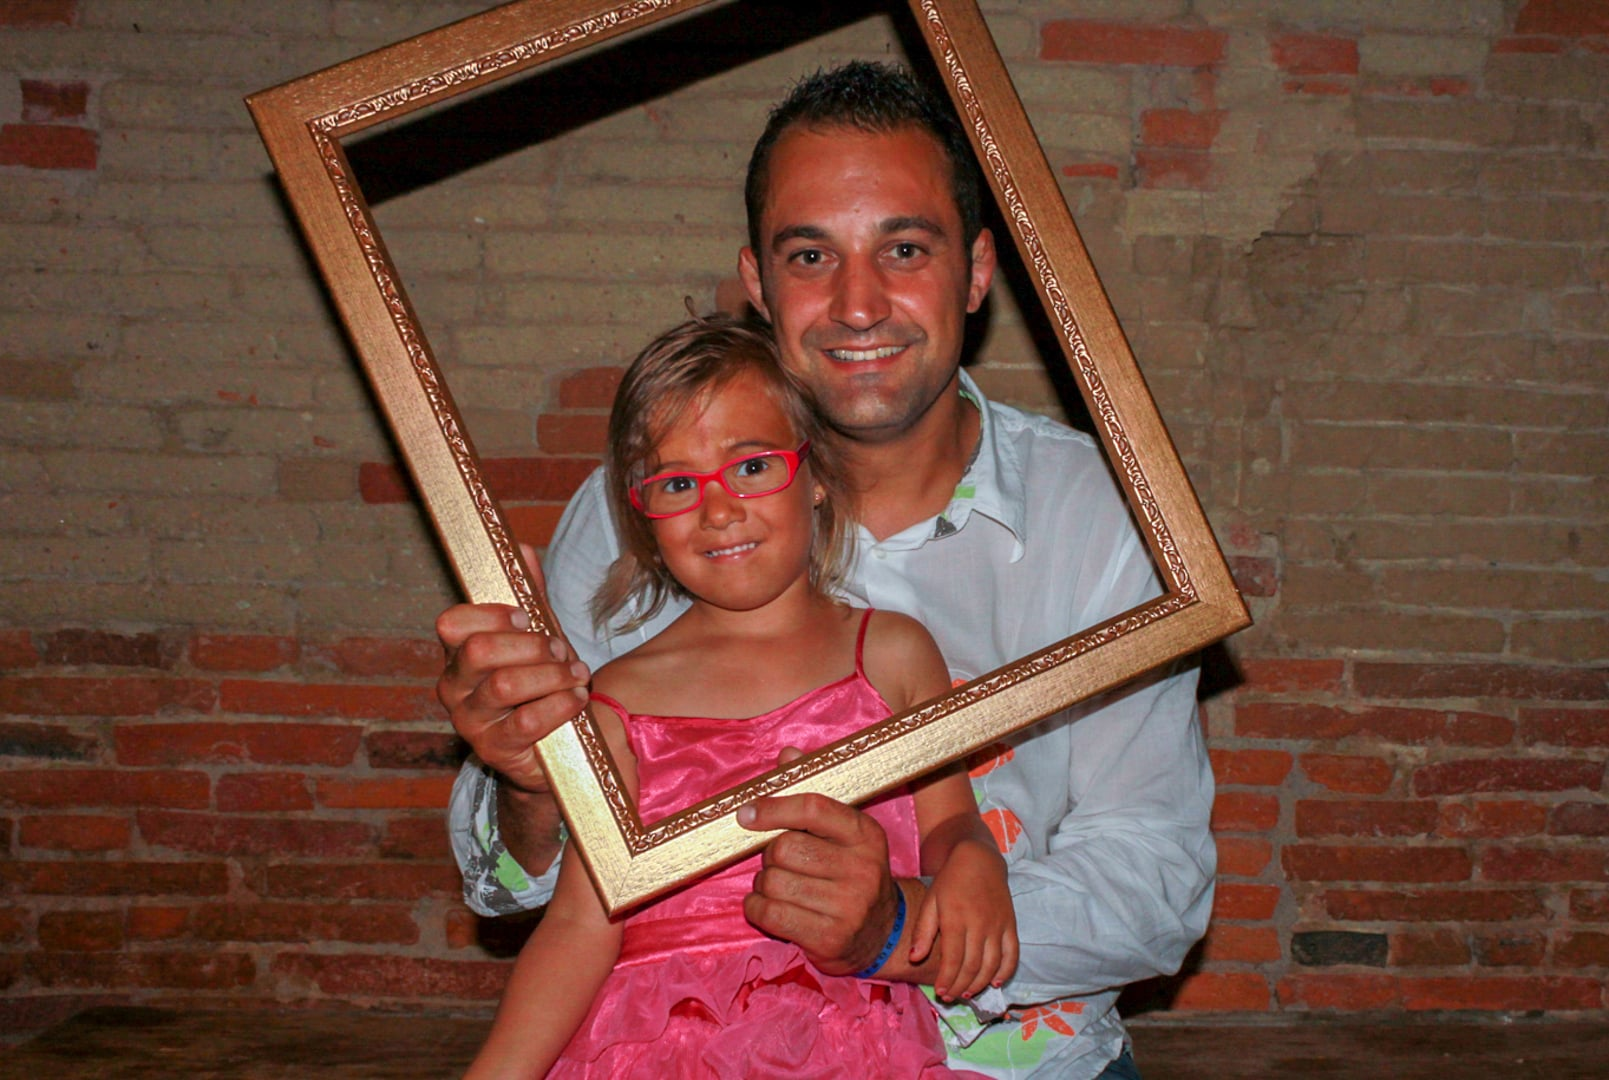 photographe photobooth mariage haute garonne - Photographe Mariage Haute Garonne